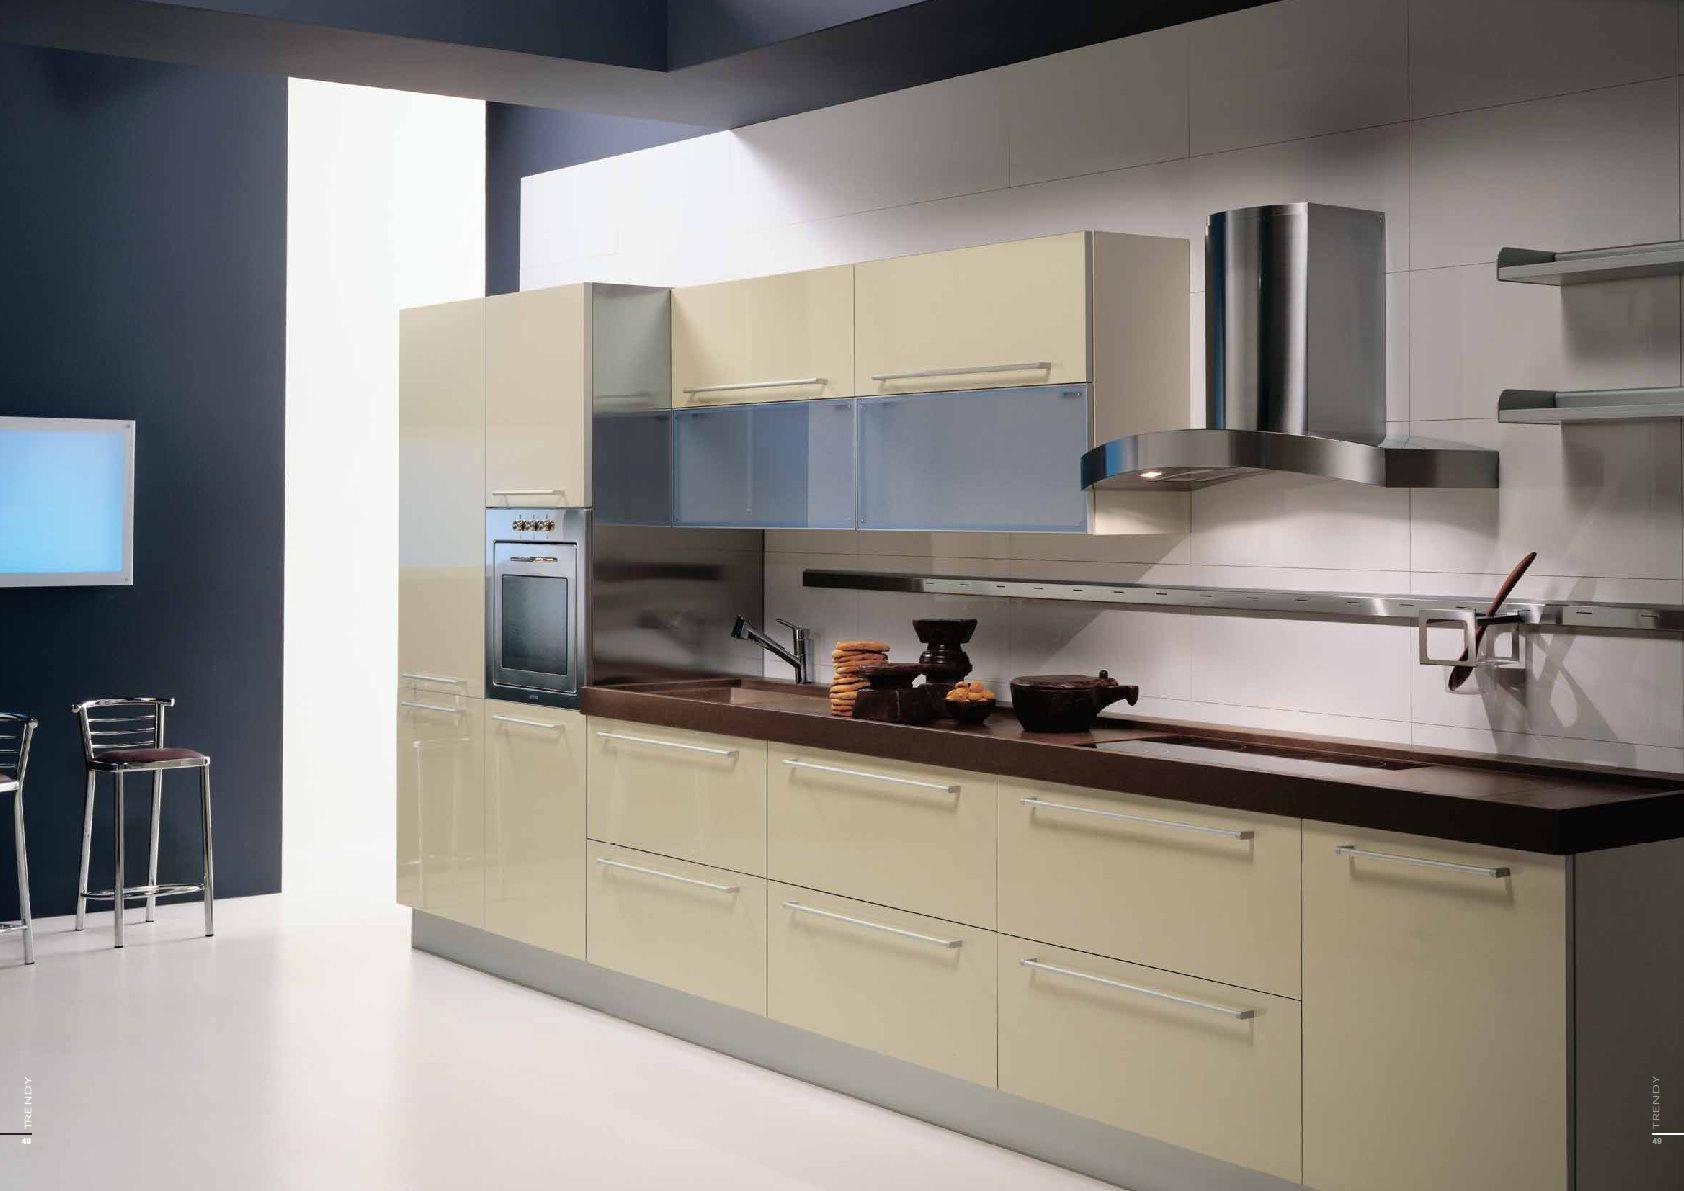 Фото кухни 3 метра в длину дизайн